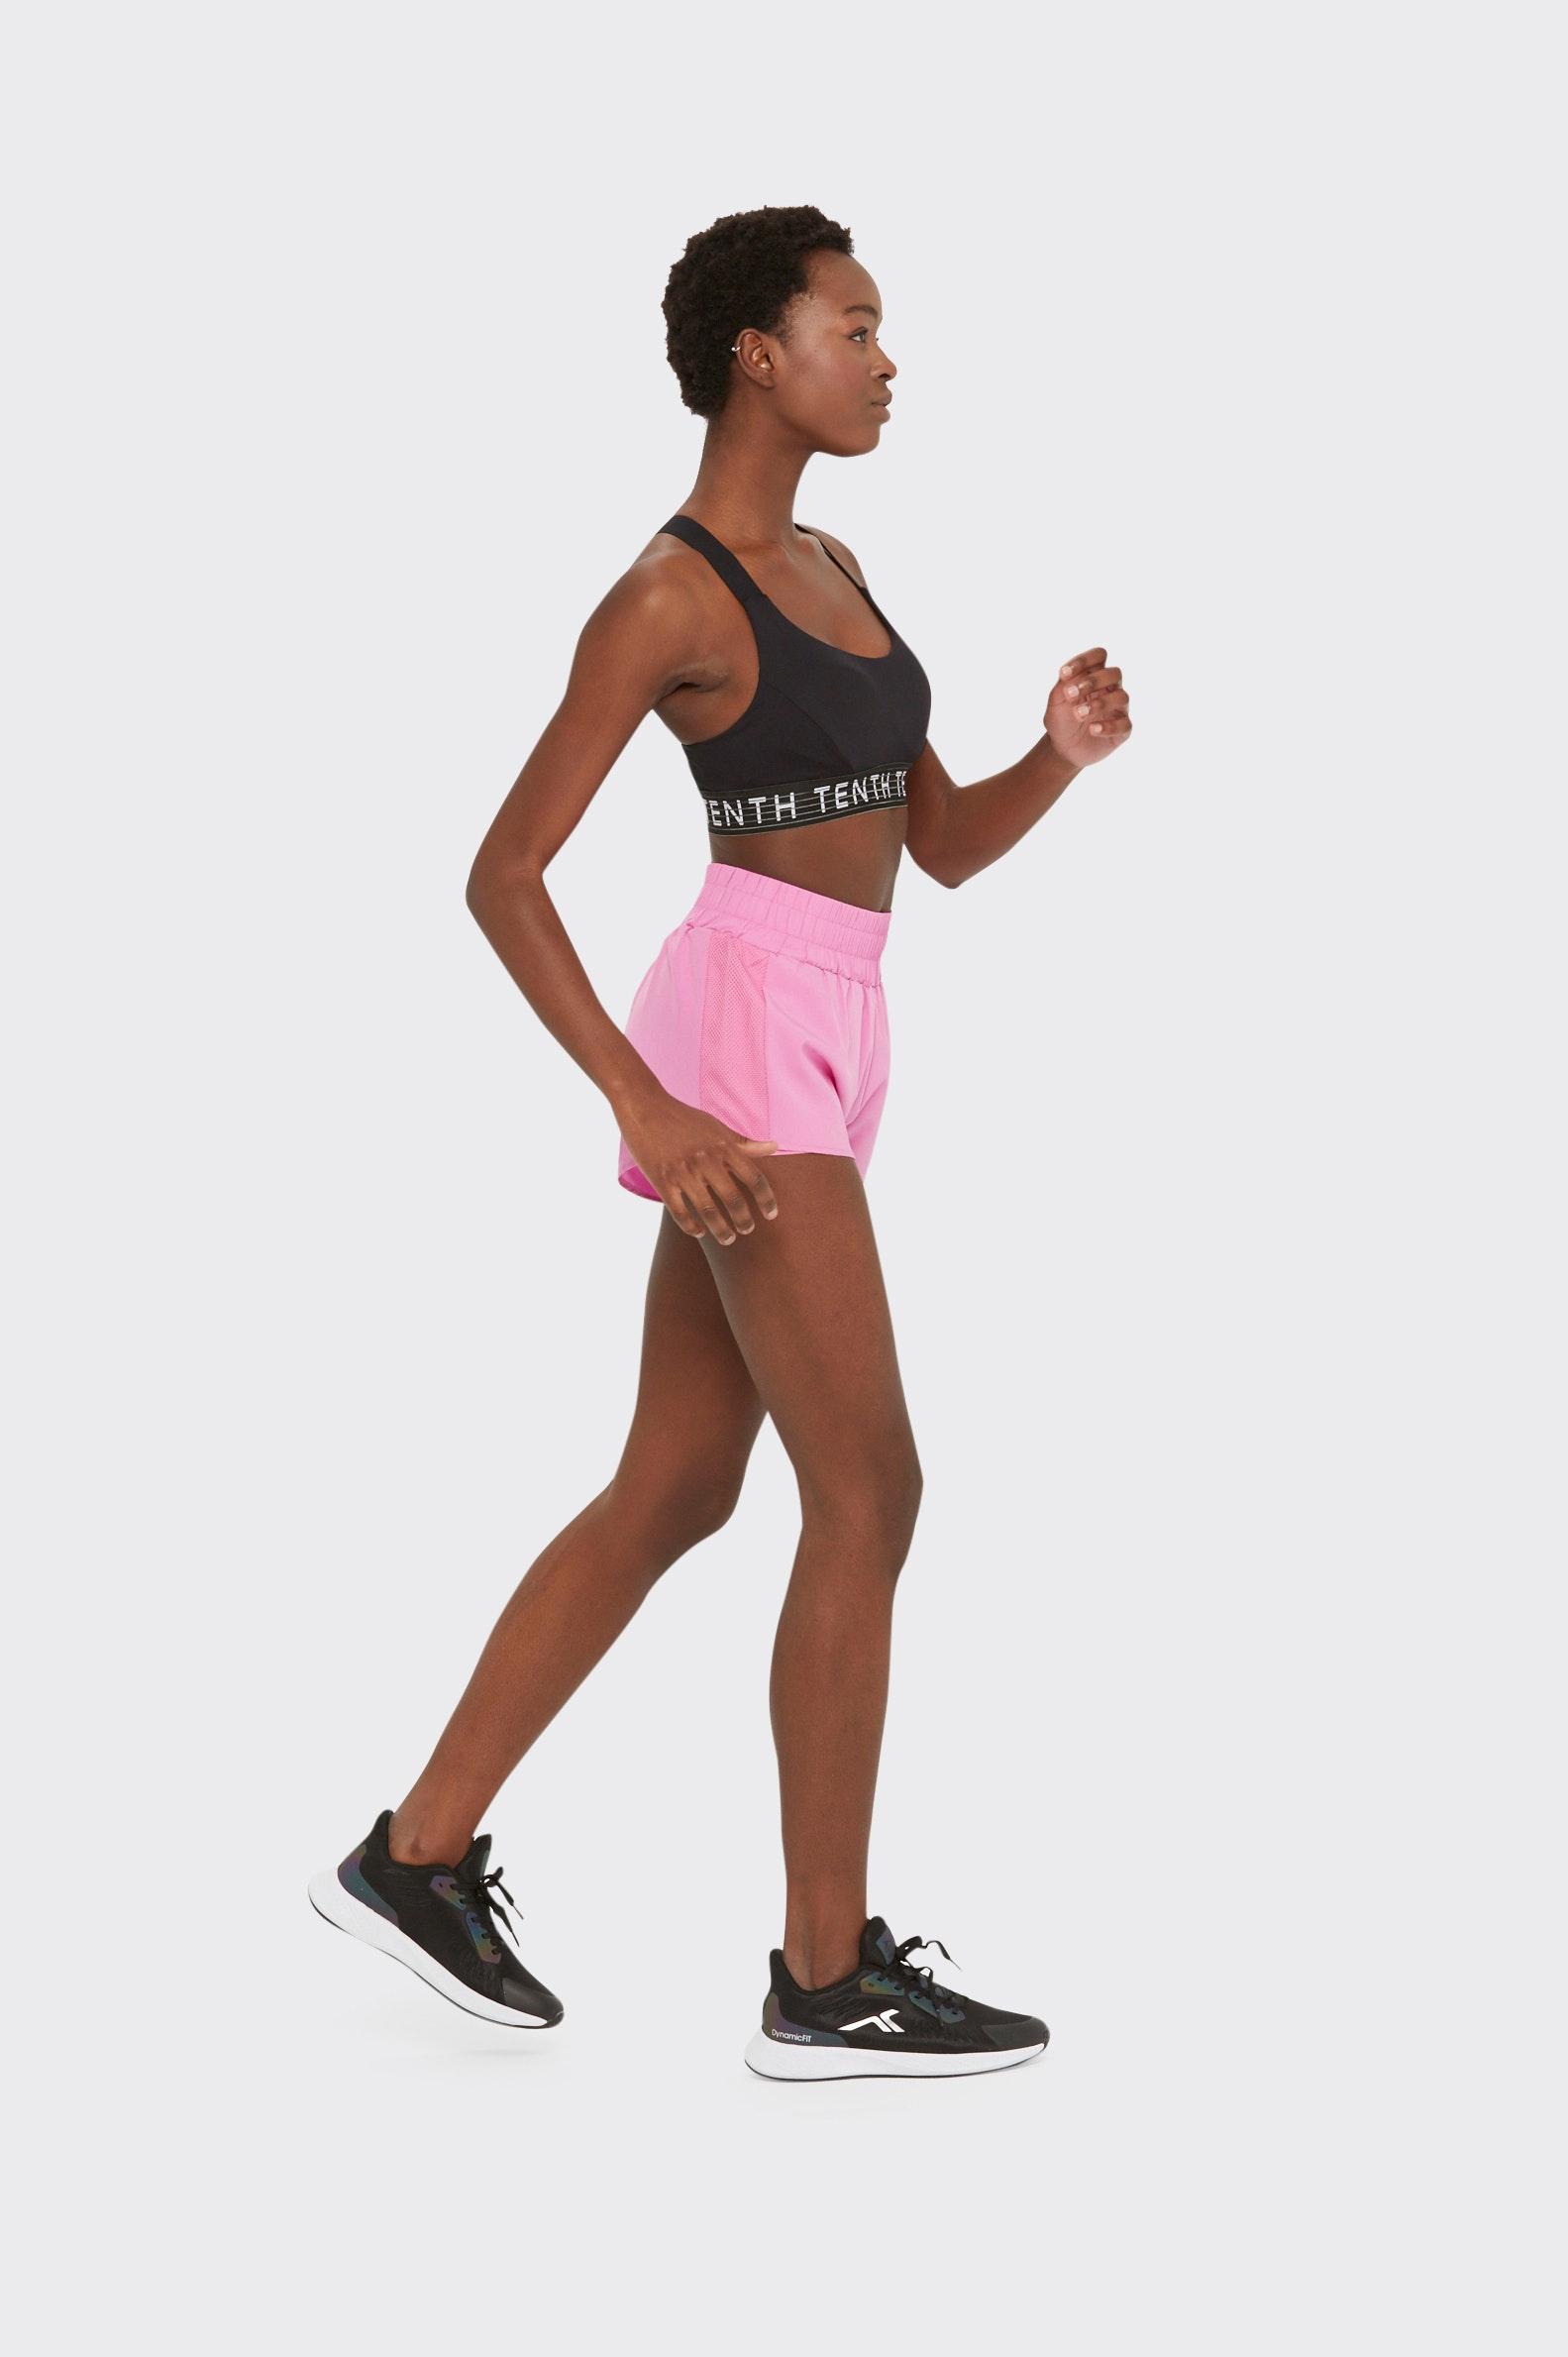 SOUTIEN RUNNING TENTH HIGH GOMA ELABORADA MULHER